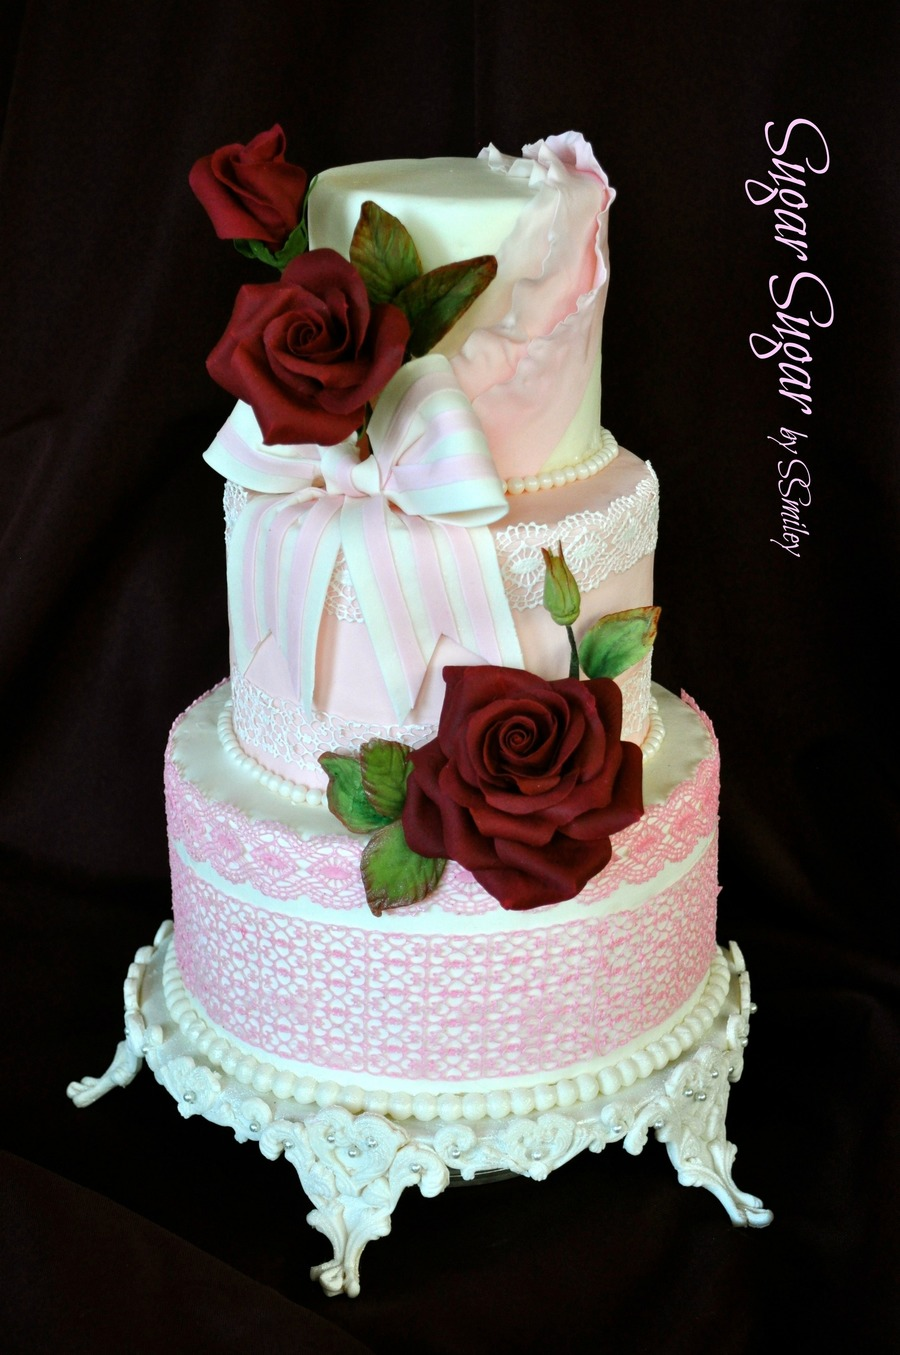 Happy birthday bonnie cakecentral happy birthday bonnie on cake central publicscrutiny Gallery